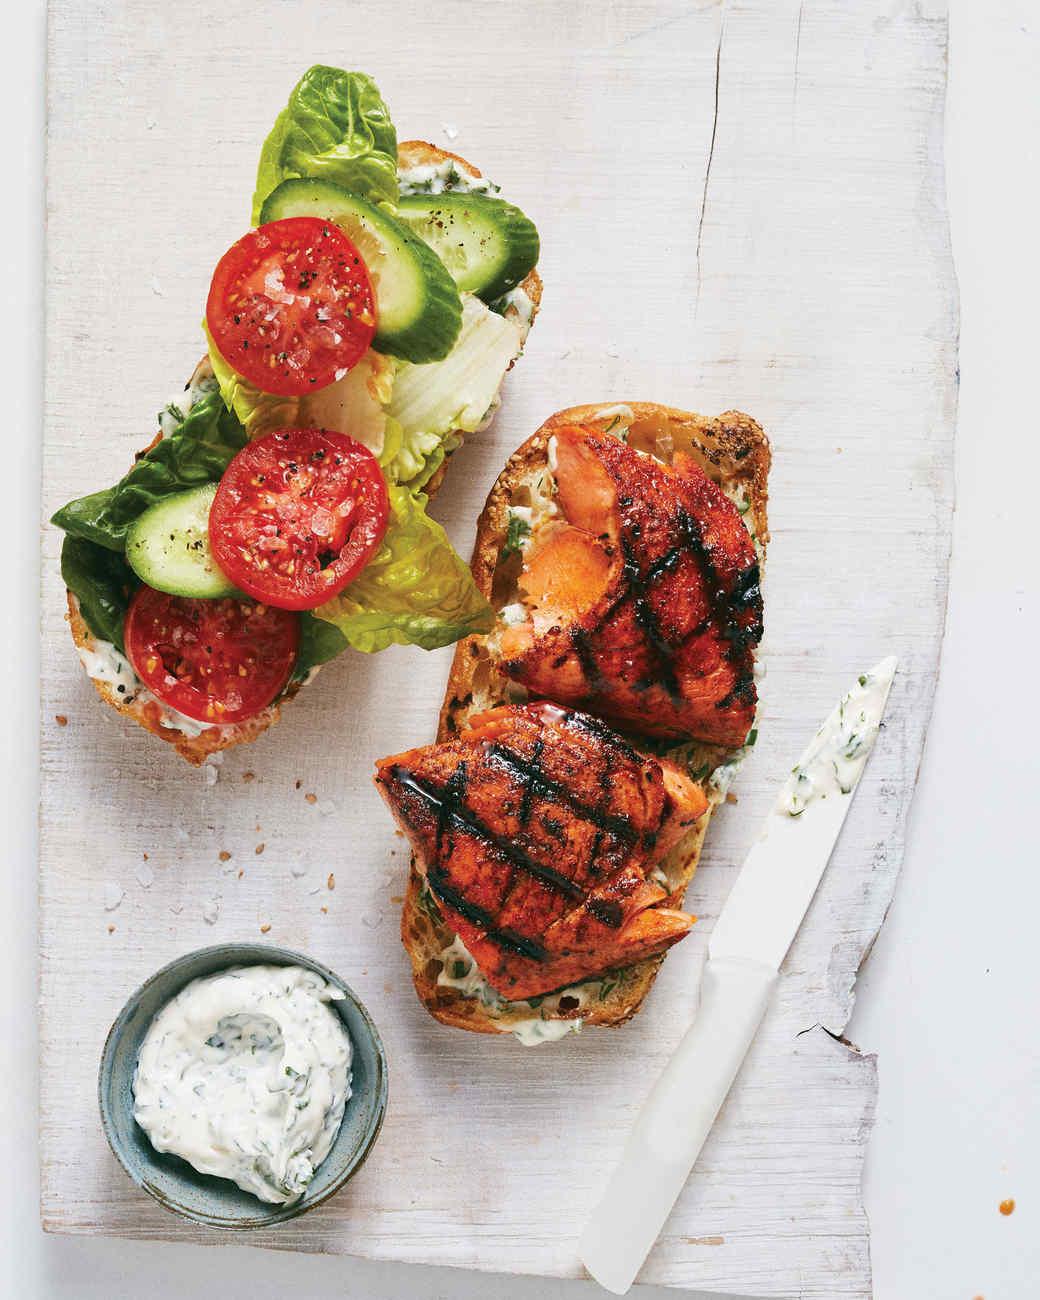 grilled-salmon-club-sandwich-203-d112659.jpg